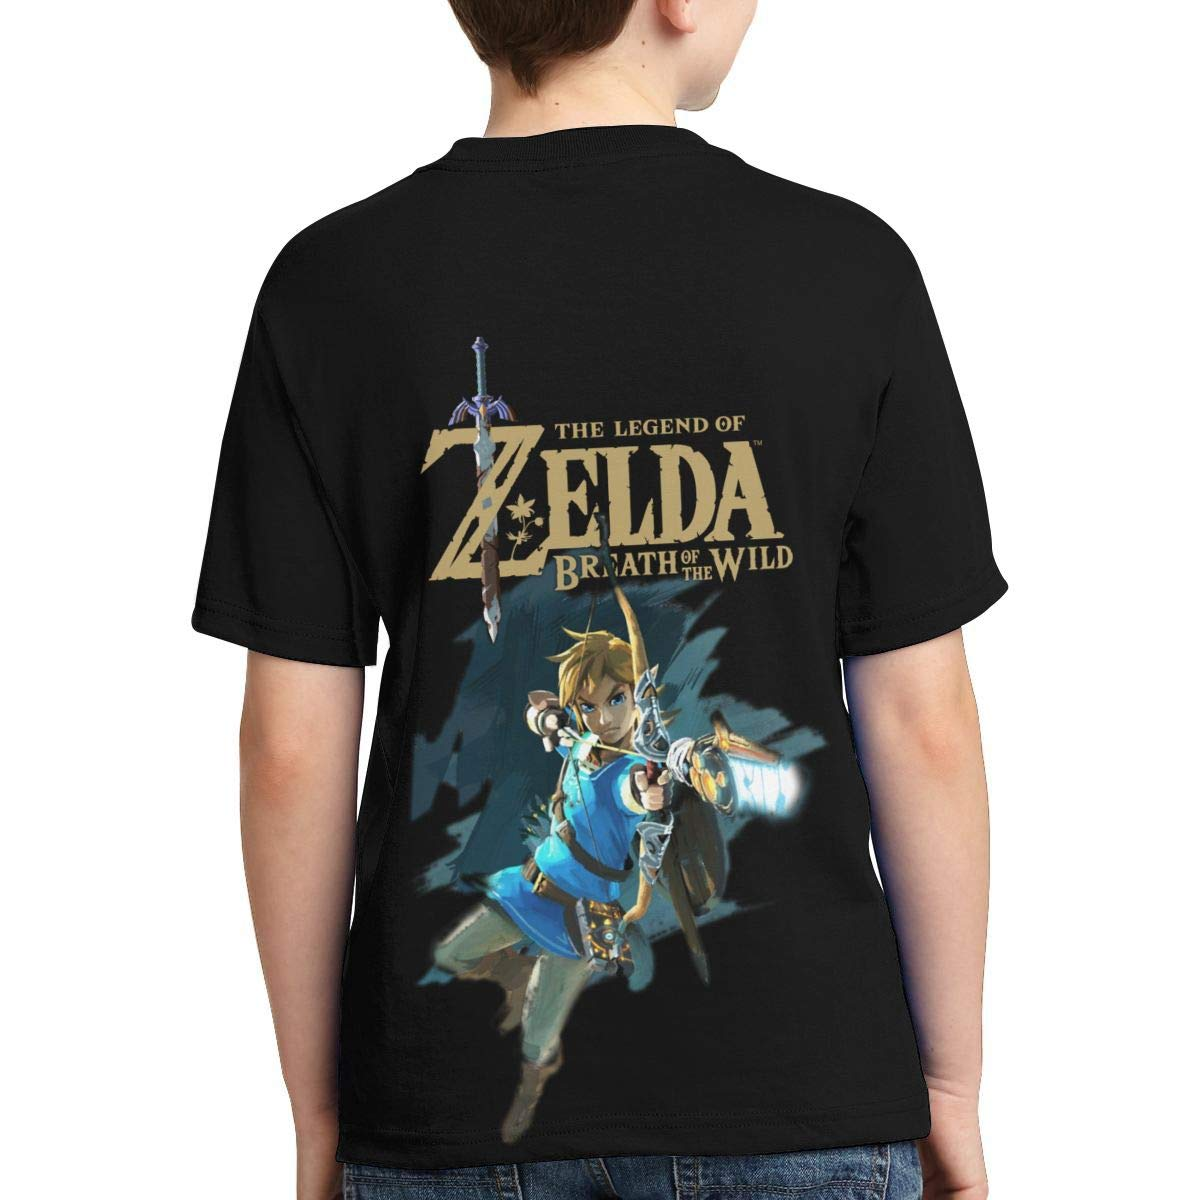 Hatstng The Legend of Zelda Boys Girls 3D Print Crew Tee Youth Short Sleeve T-Shirt Tanks Tops